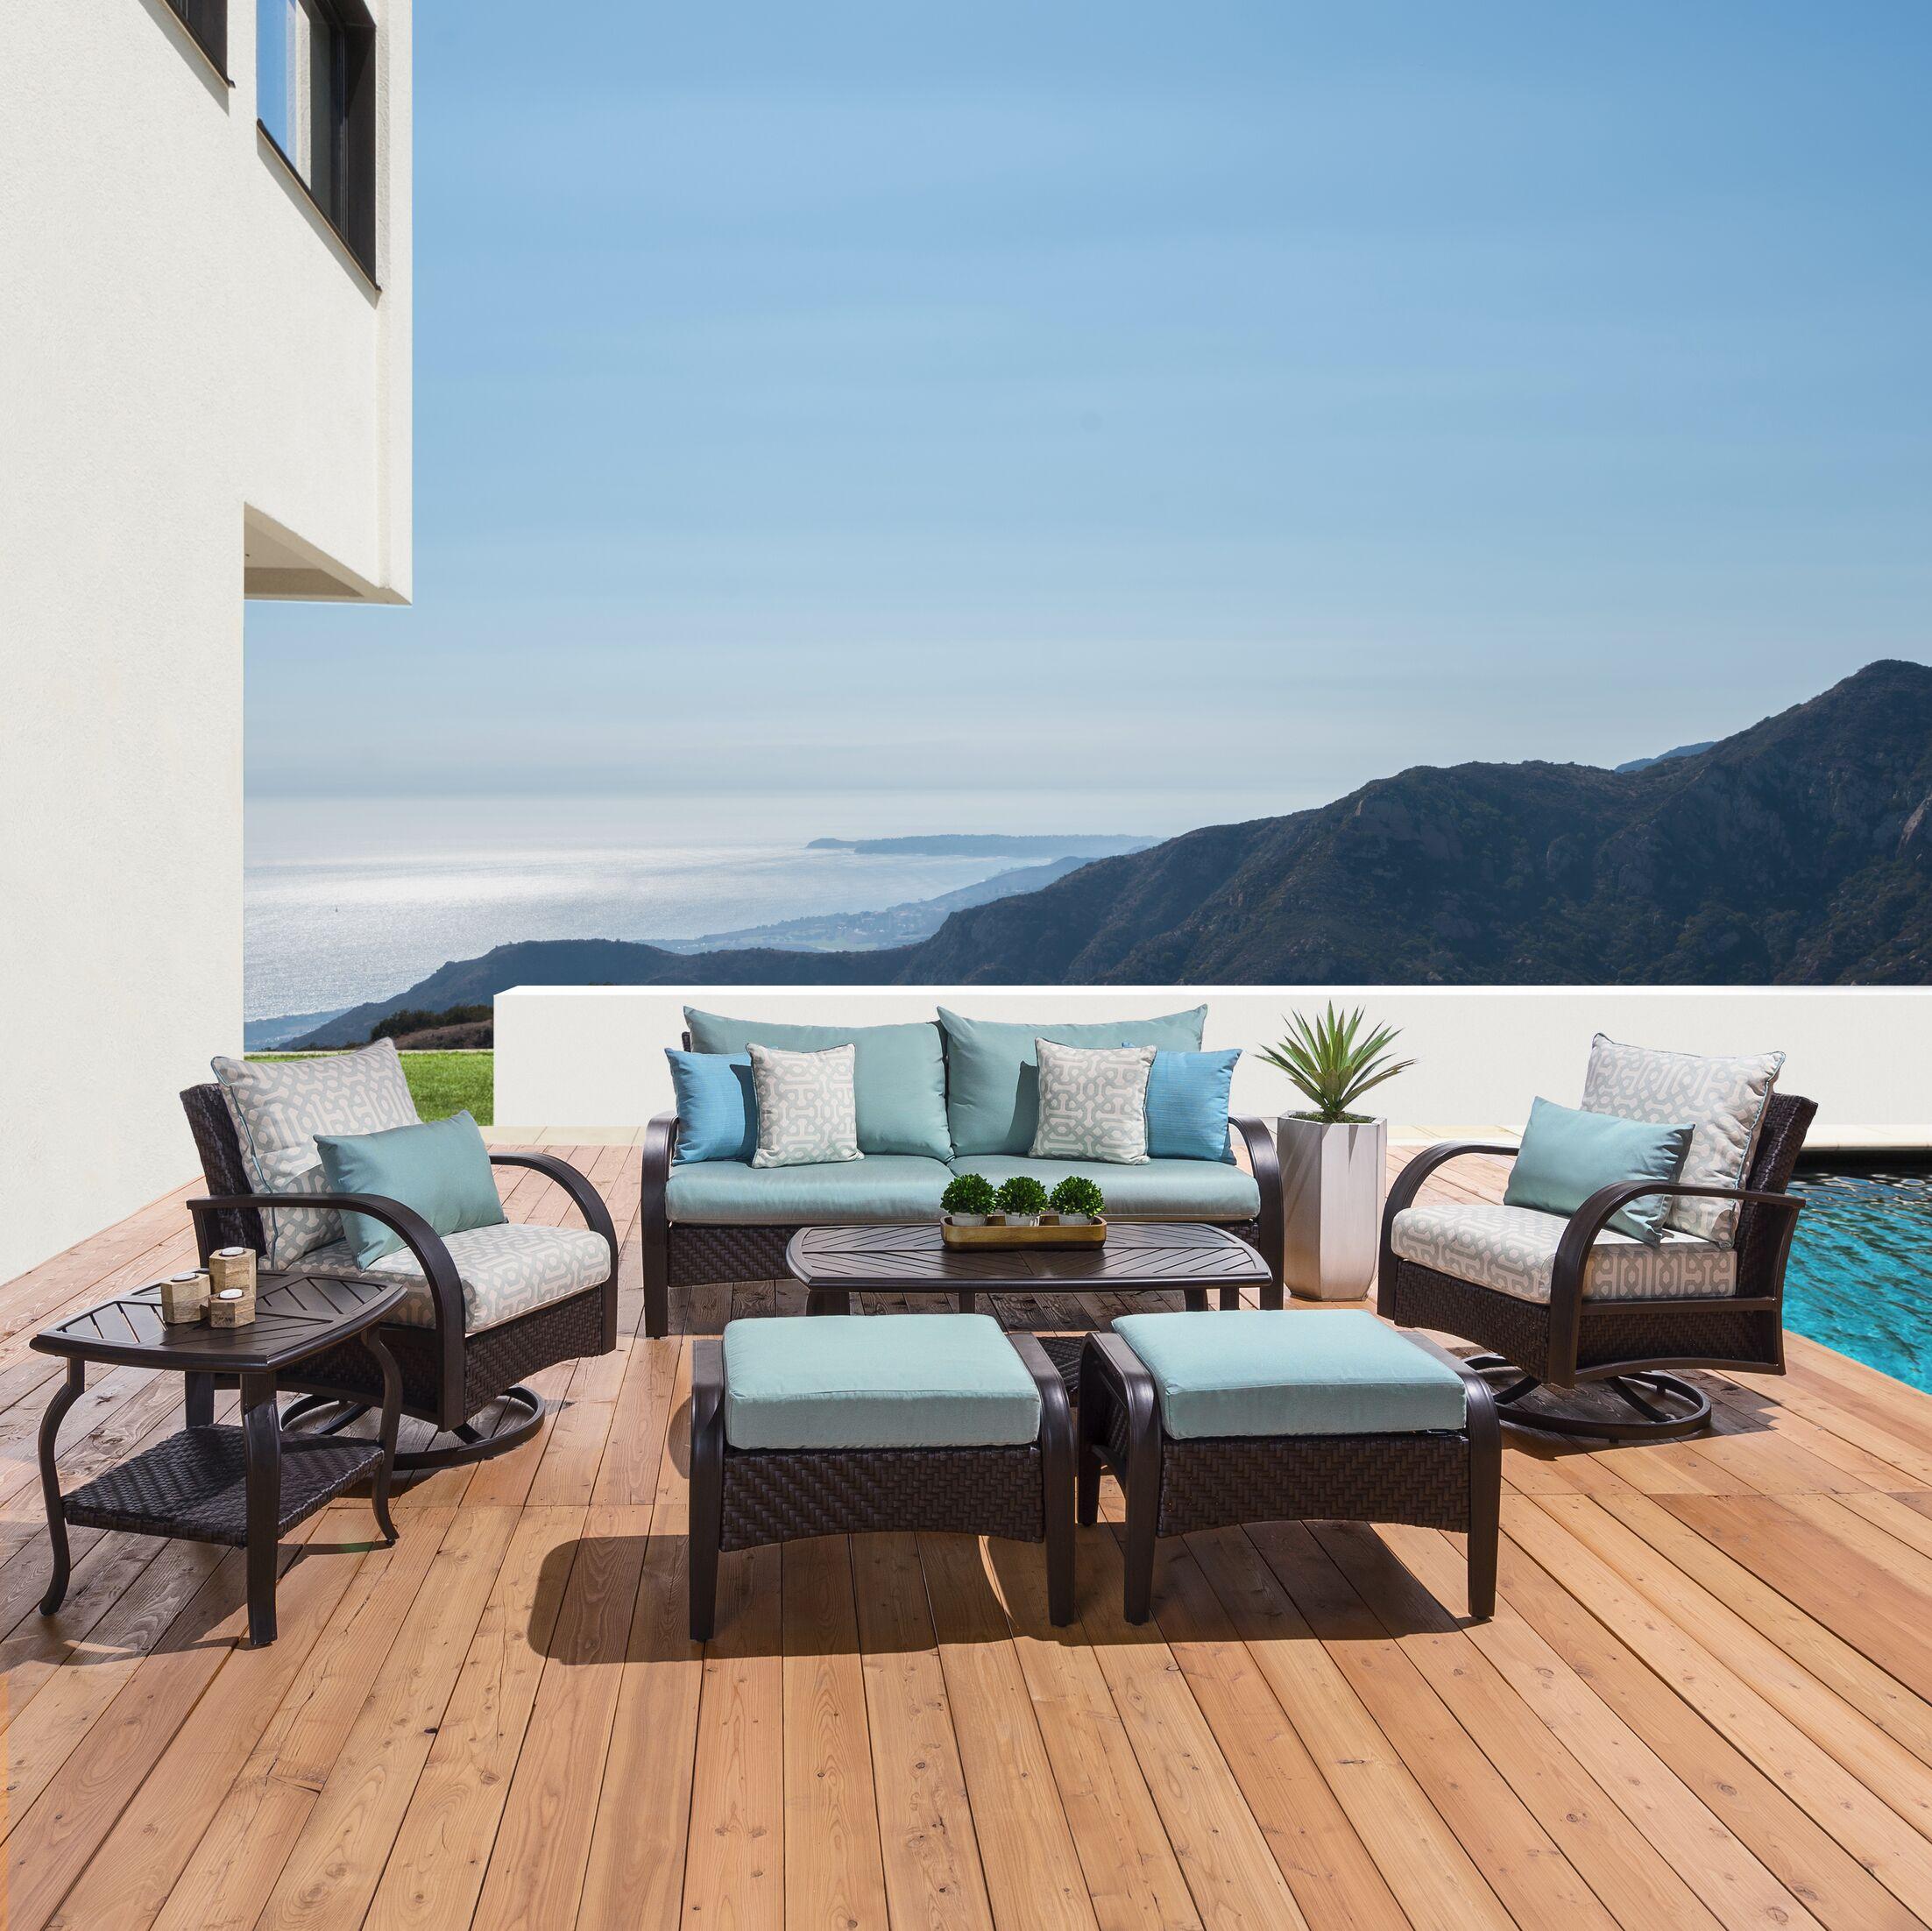 Cumberland 7 Piece Sunbrella Sofa Set with Cushions Cushion Color: Spa Blue Deluxe